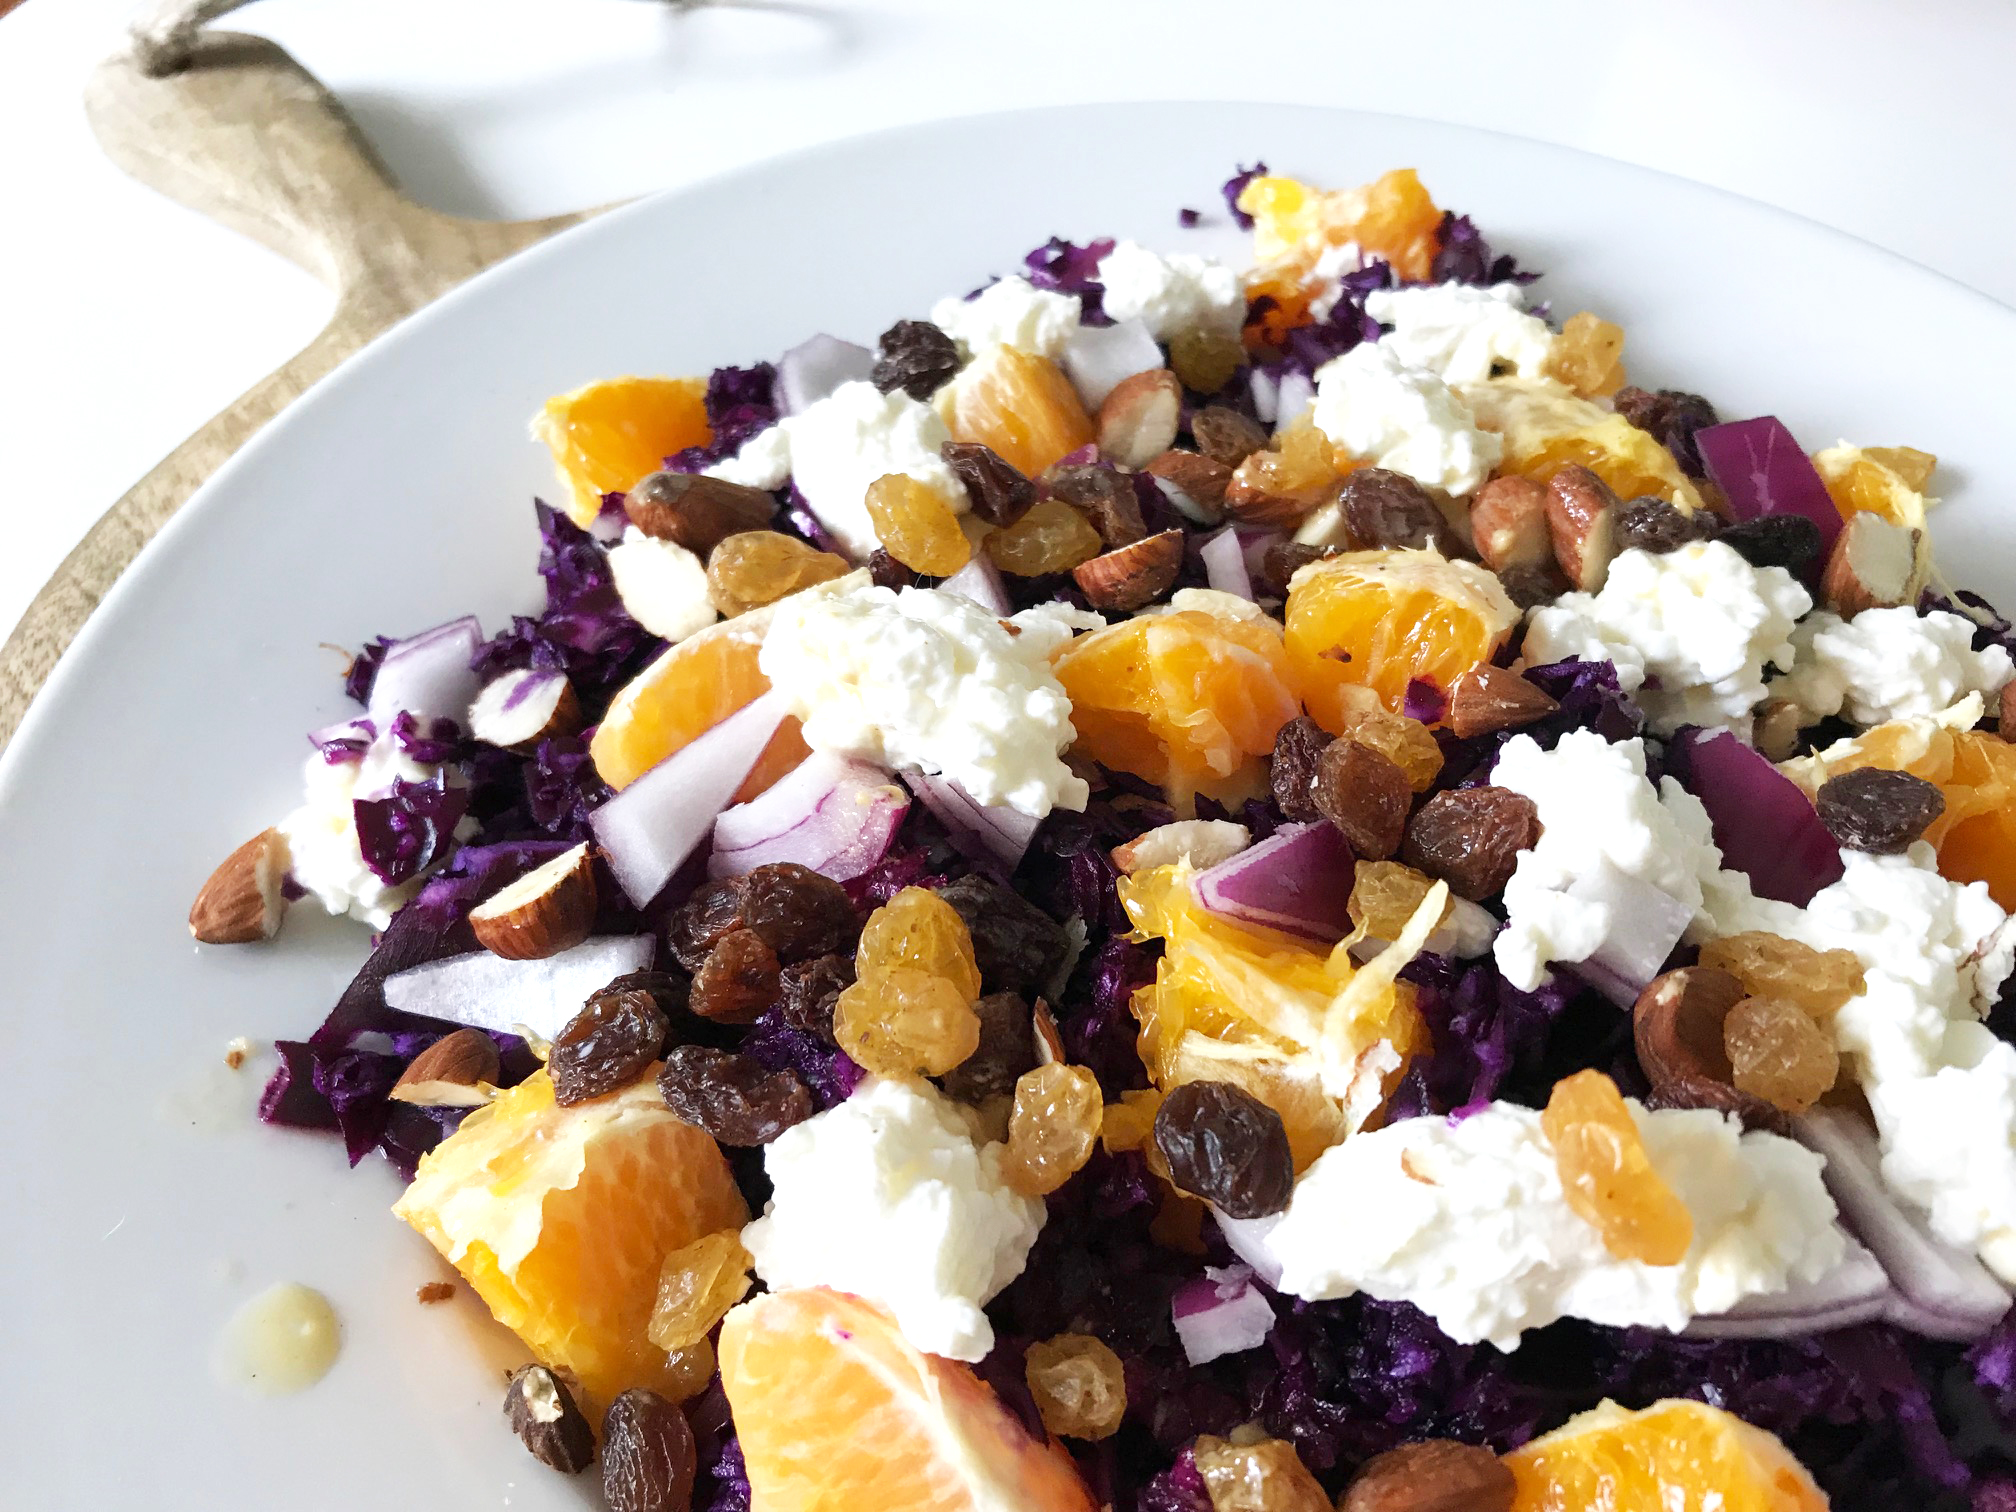 Recept: Salade met rode kool, sinaasappel & cottage cheese